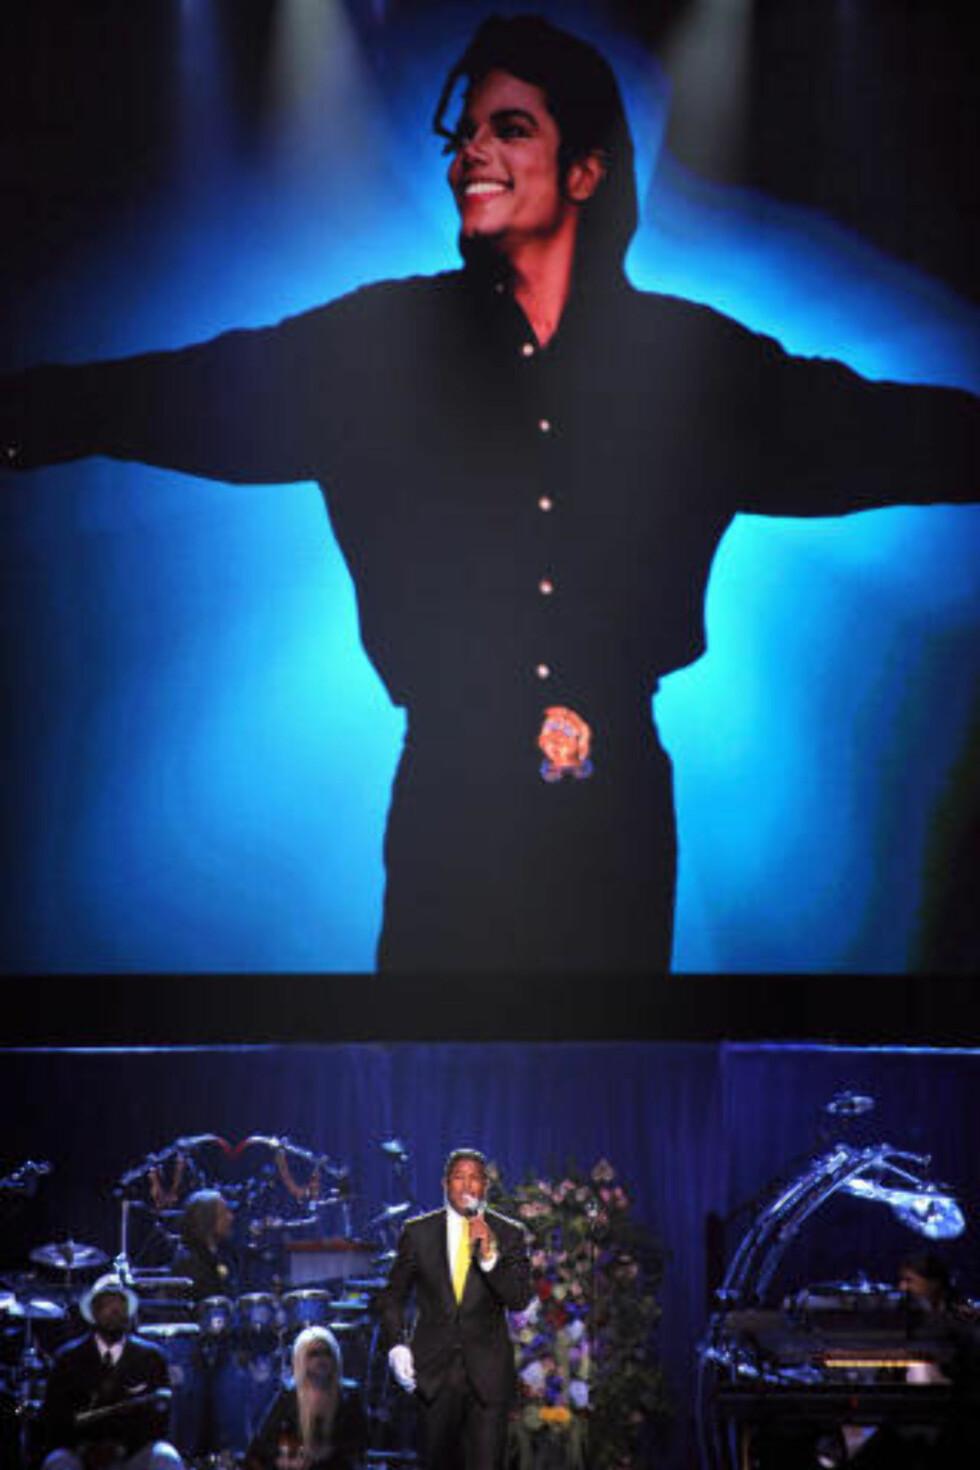 MINNESTUND: Michael Jacksons bror, Jermaine Jackson, holder en tale under minnstunden på Staples Center i Los Angeles. Foto: AFP PHOTO/GABRIEL BOUYS/POOL/Scanpix